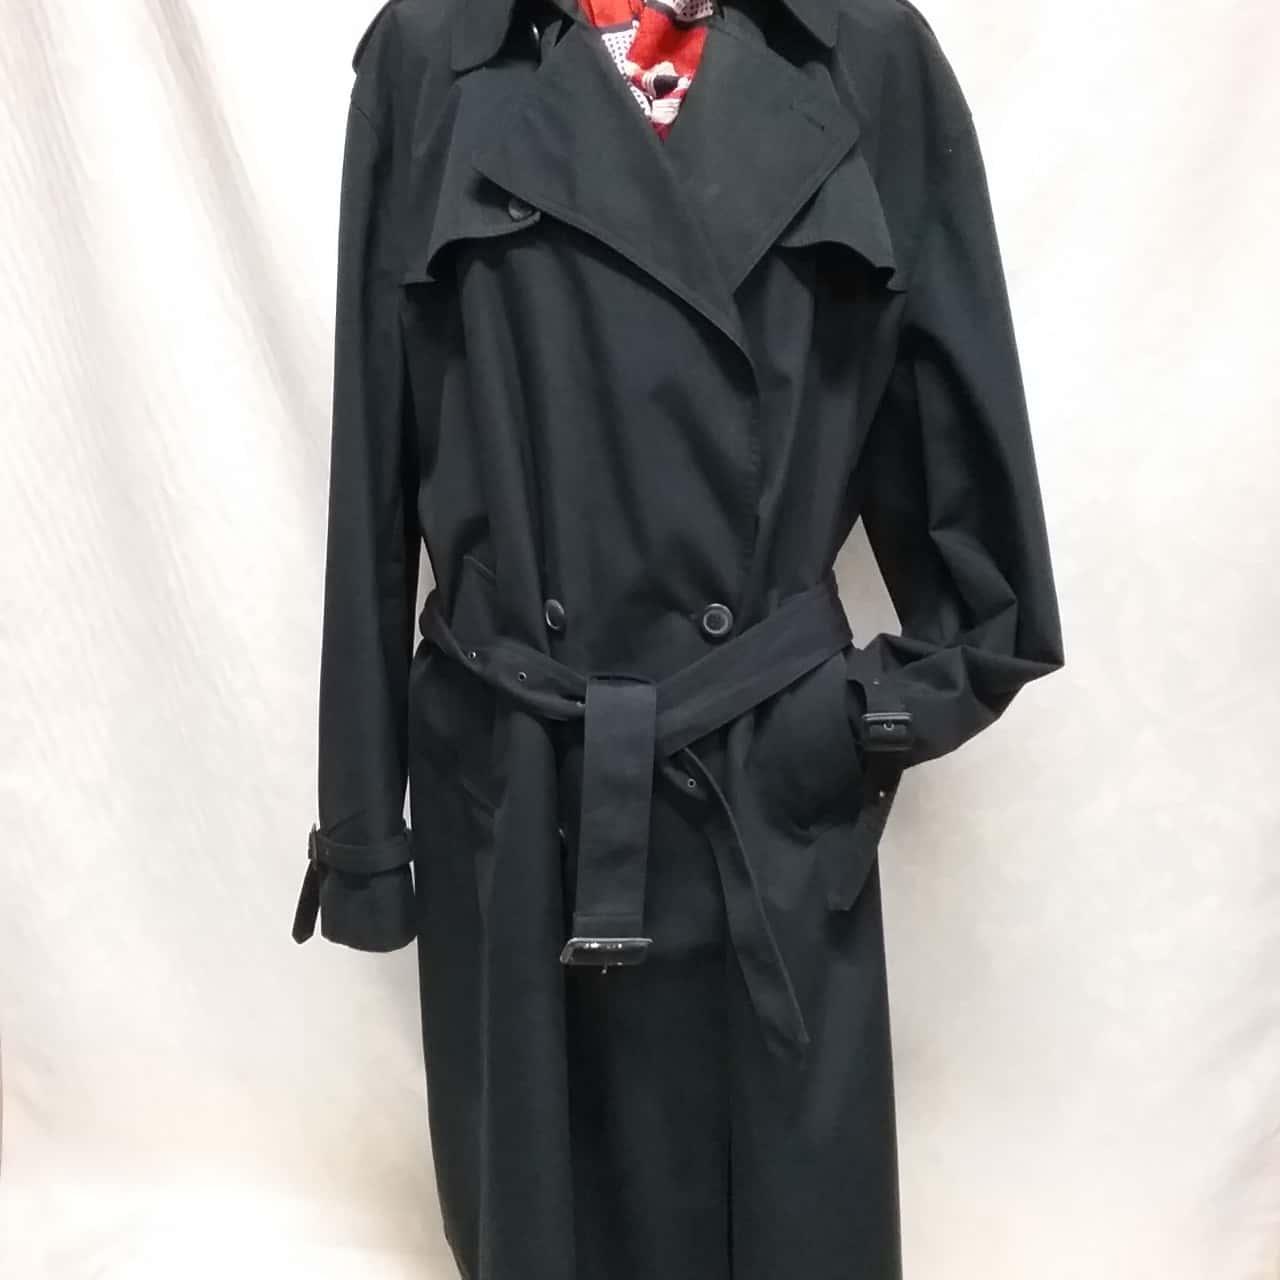 London Fog Mens Winter Coat Navy Blue 117R trench coat